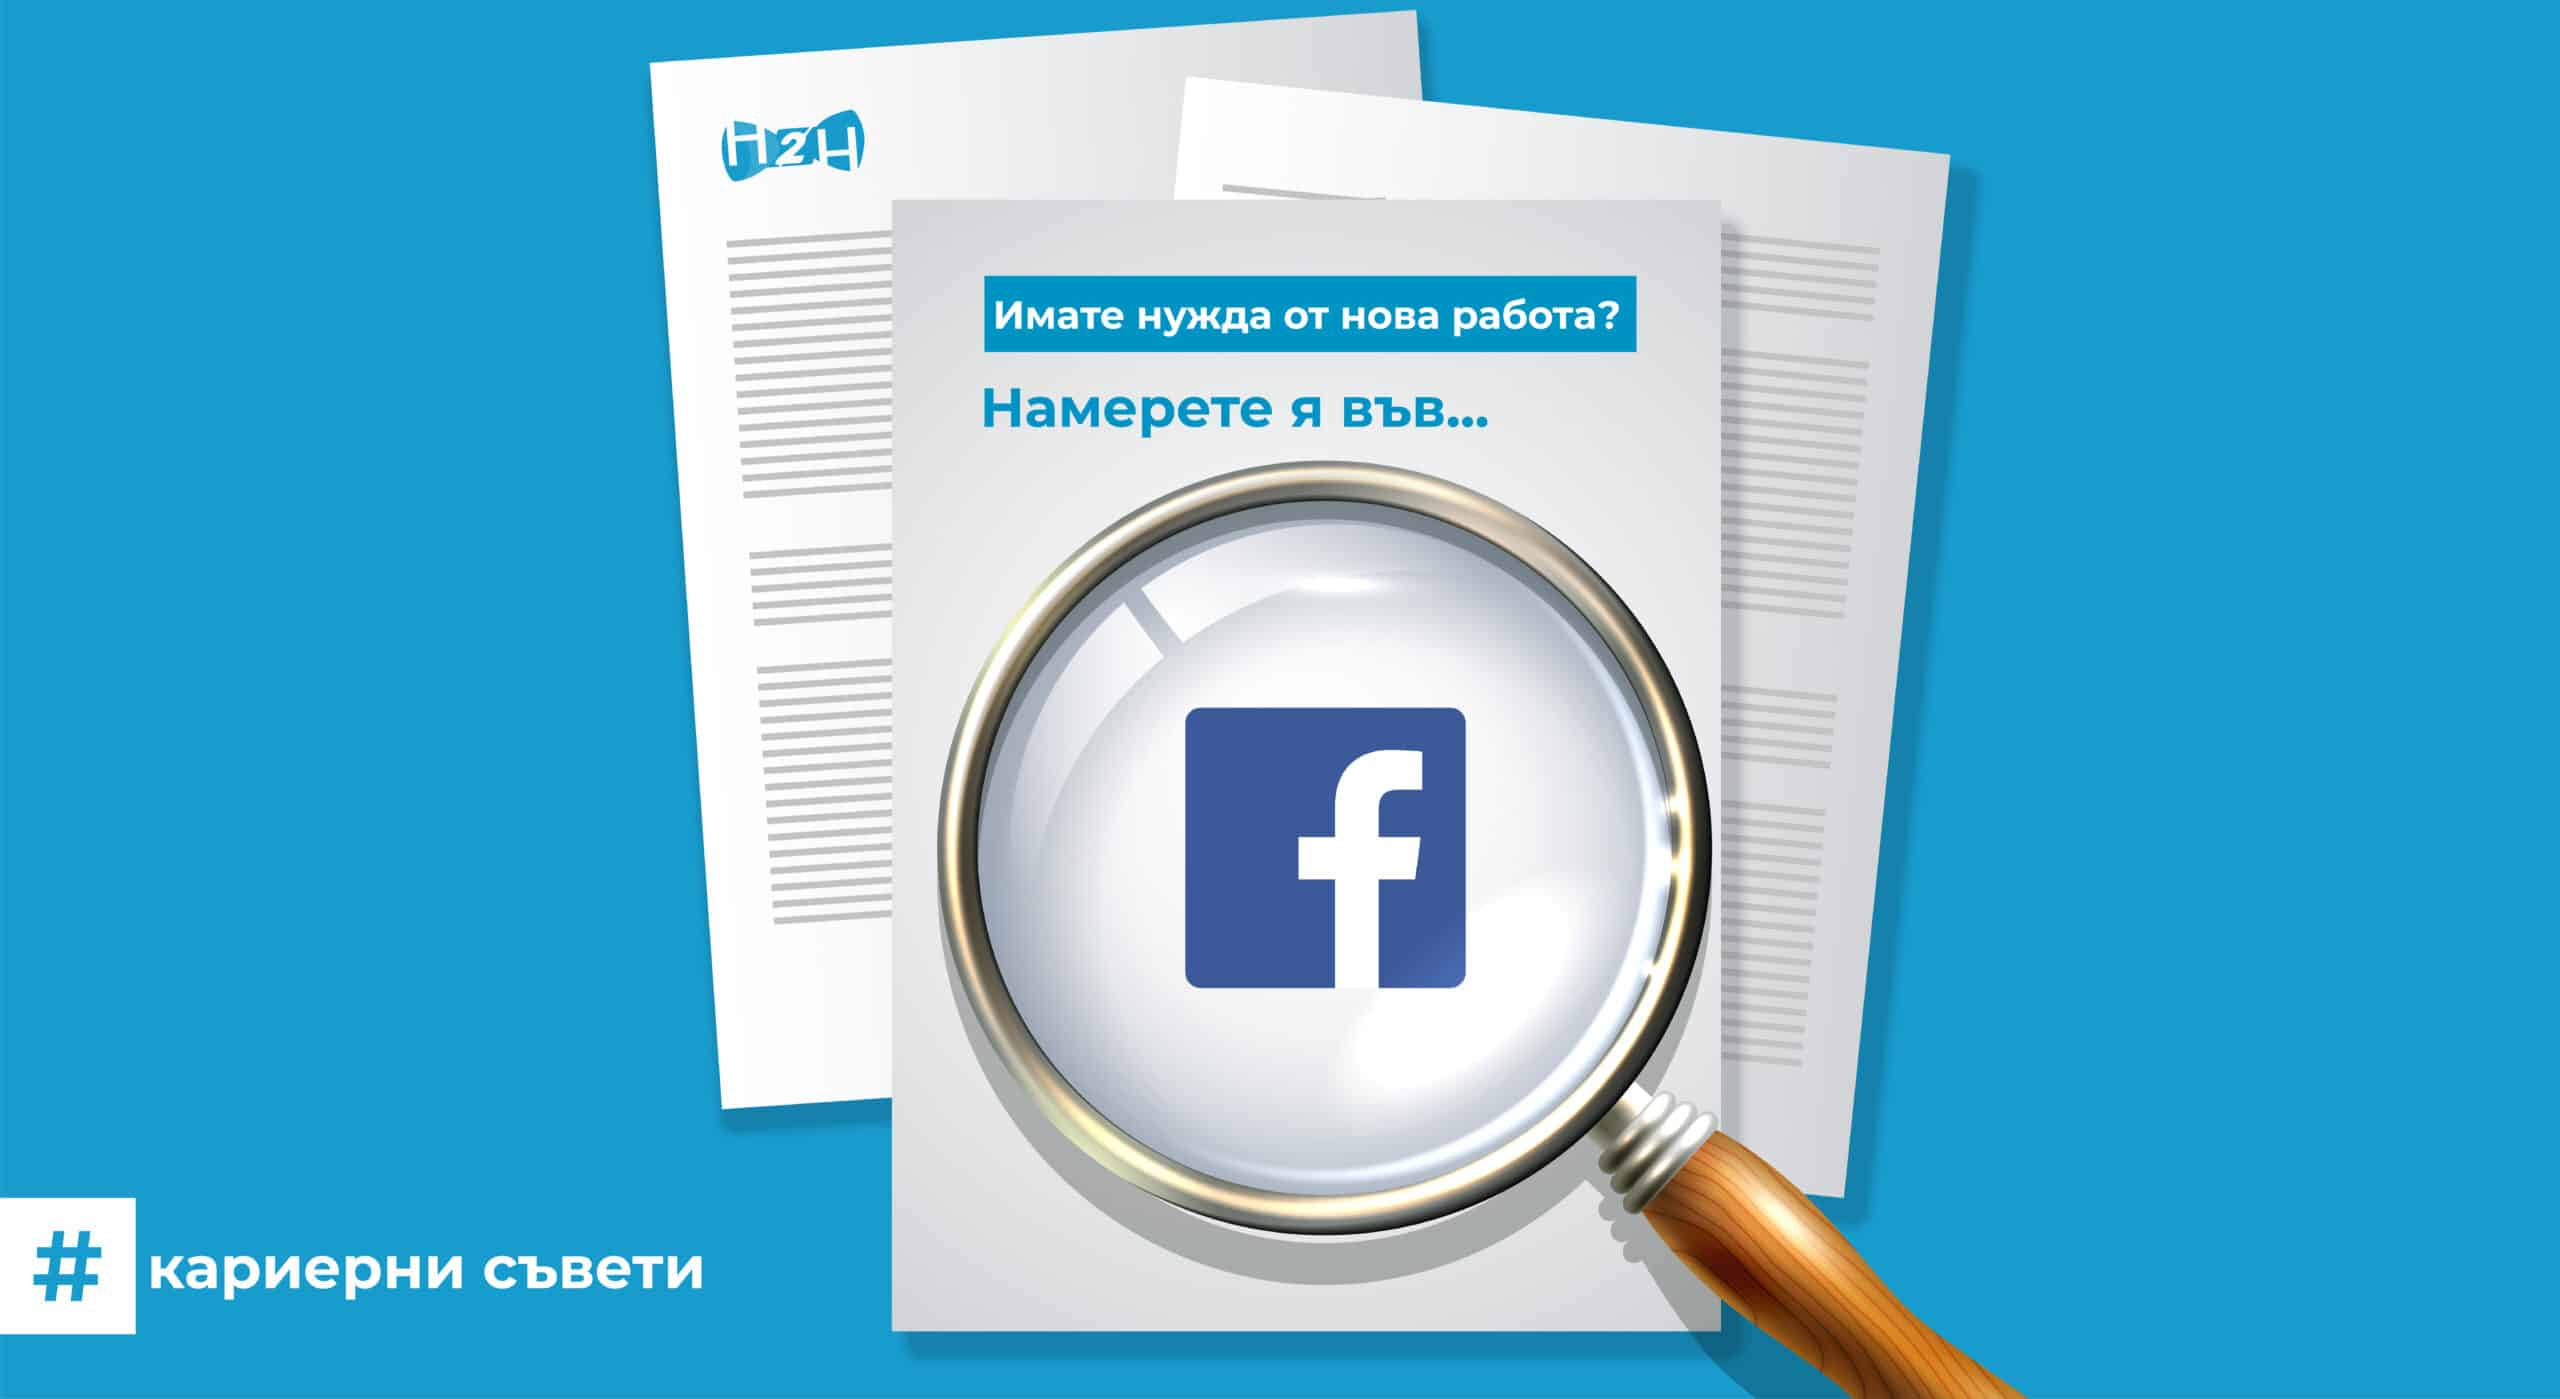 Намере работа във Facebook